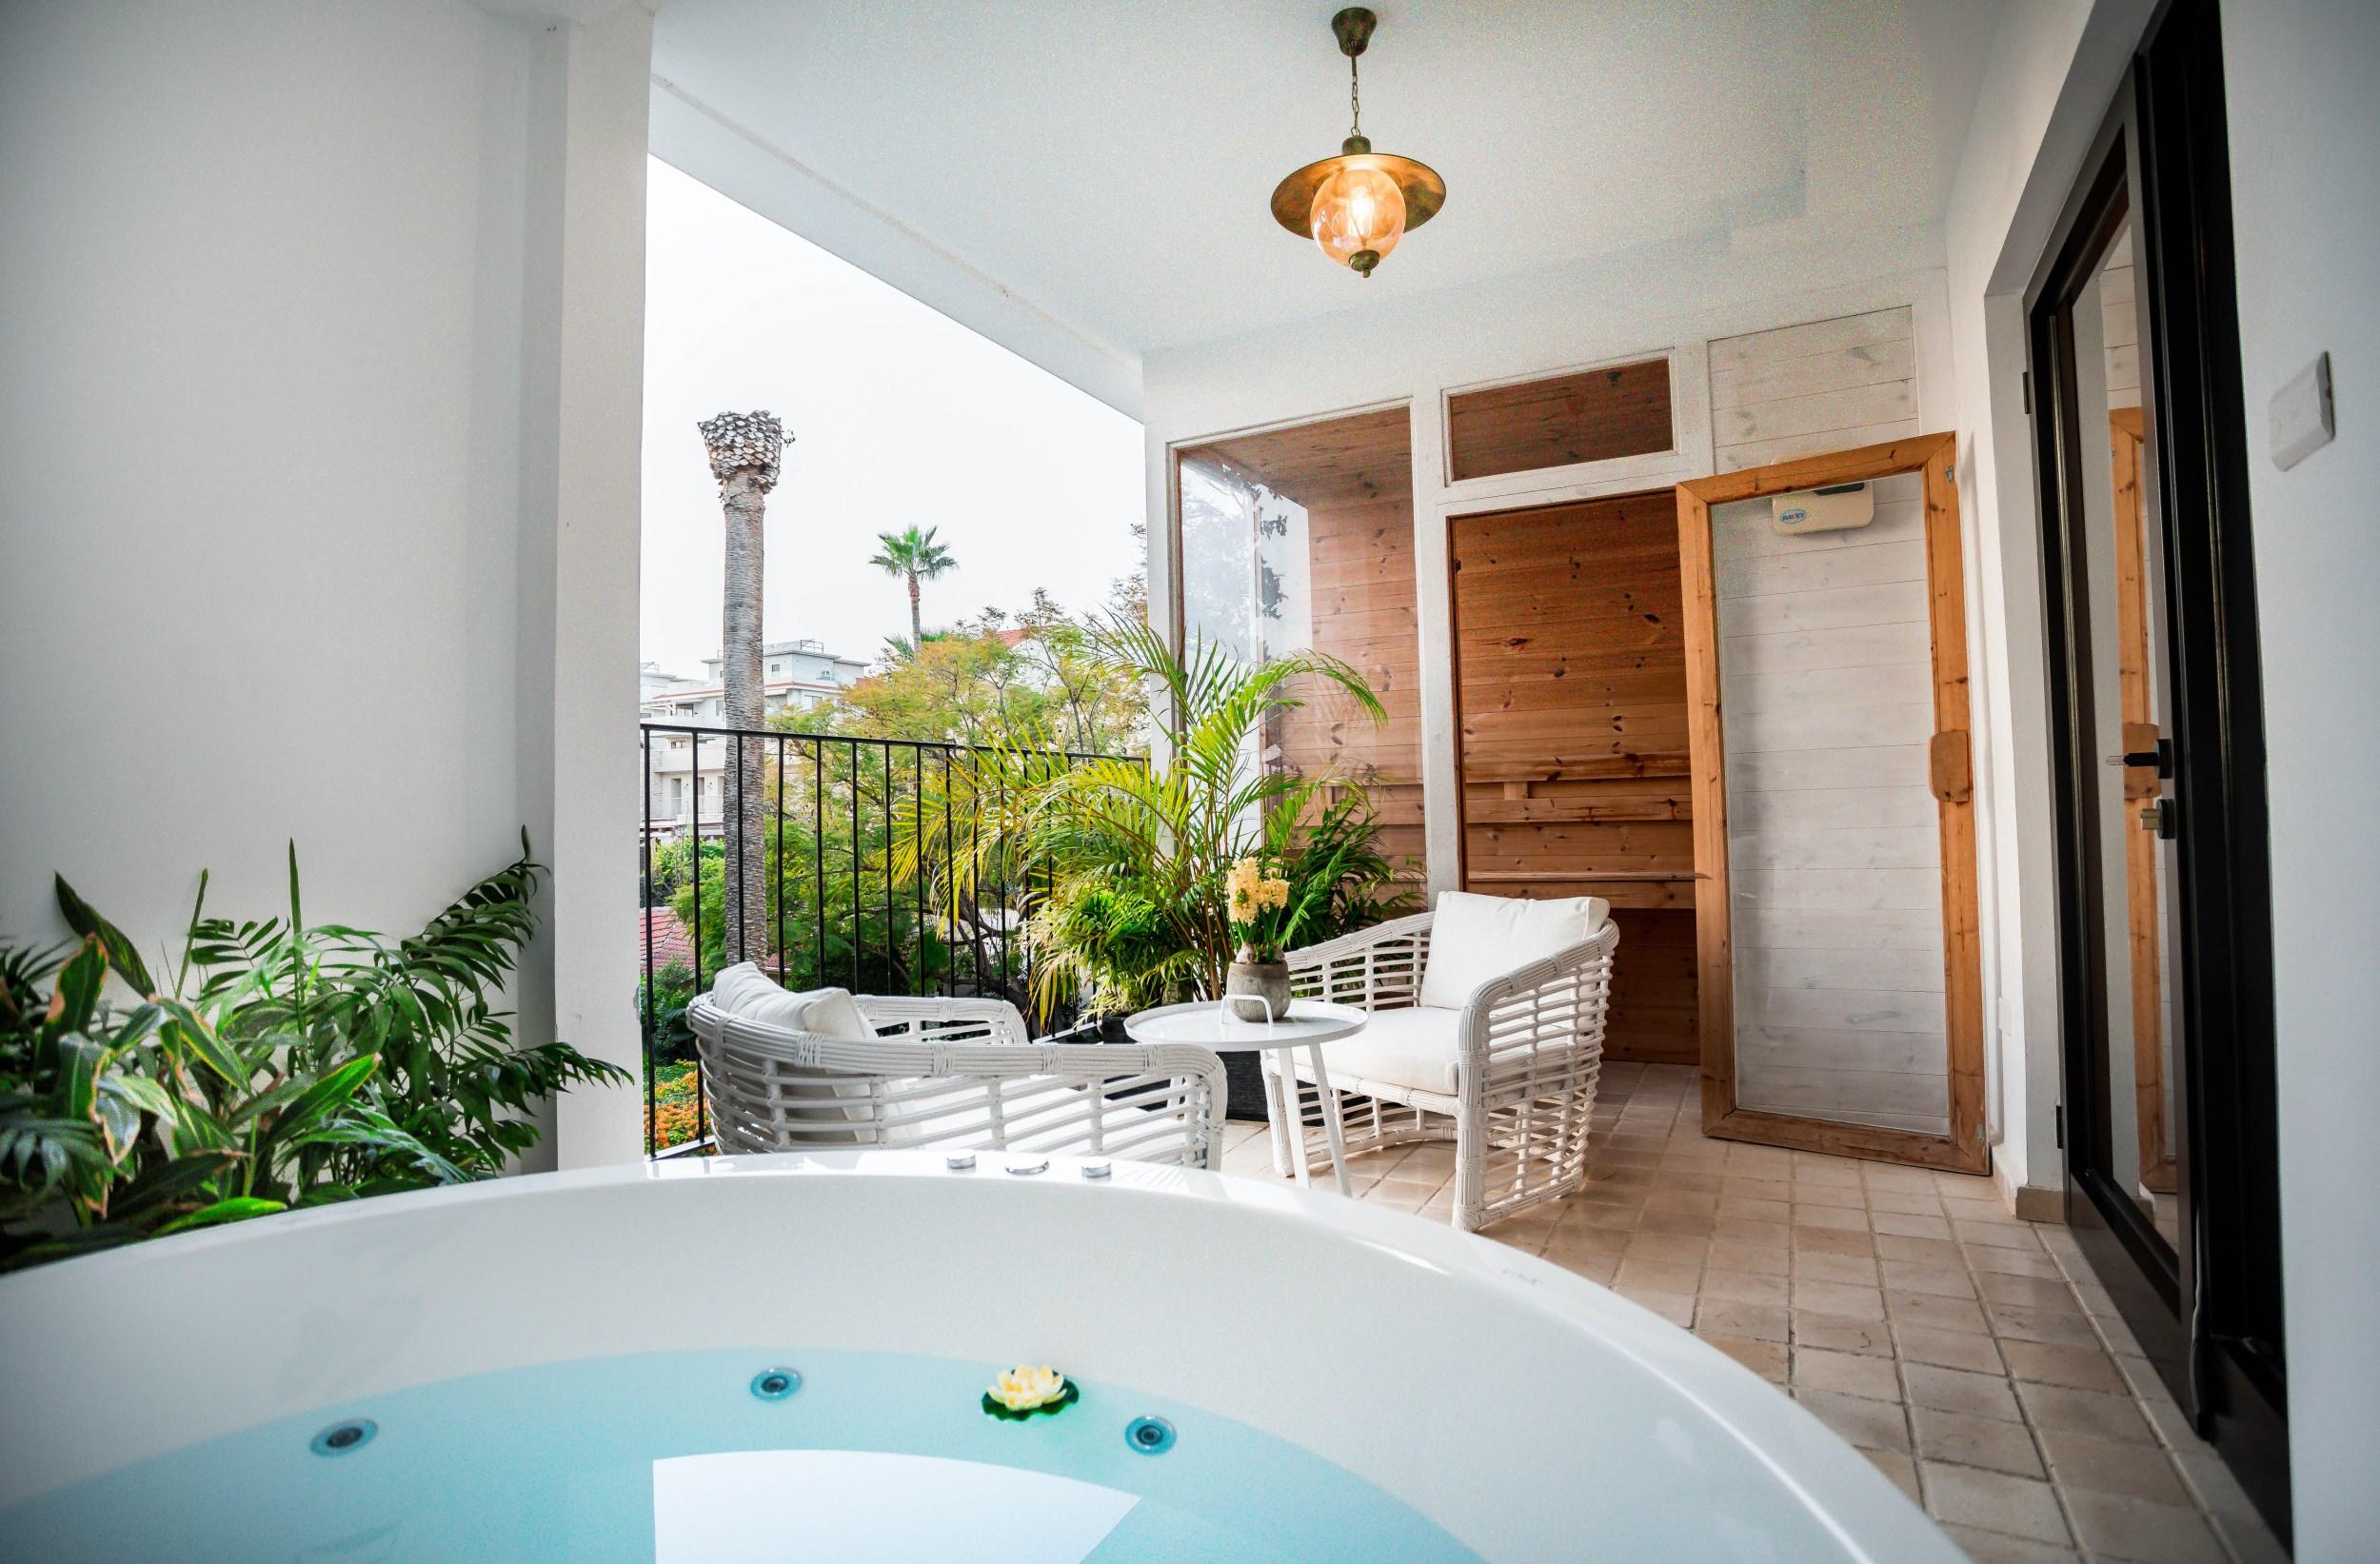 Lear Sense Hotel Gadera | Loft Jacuzzi